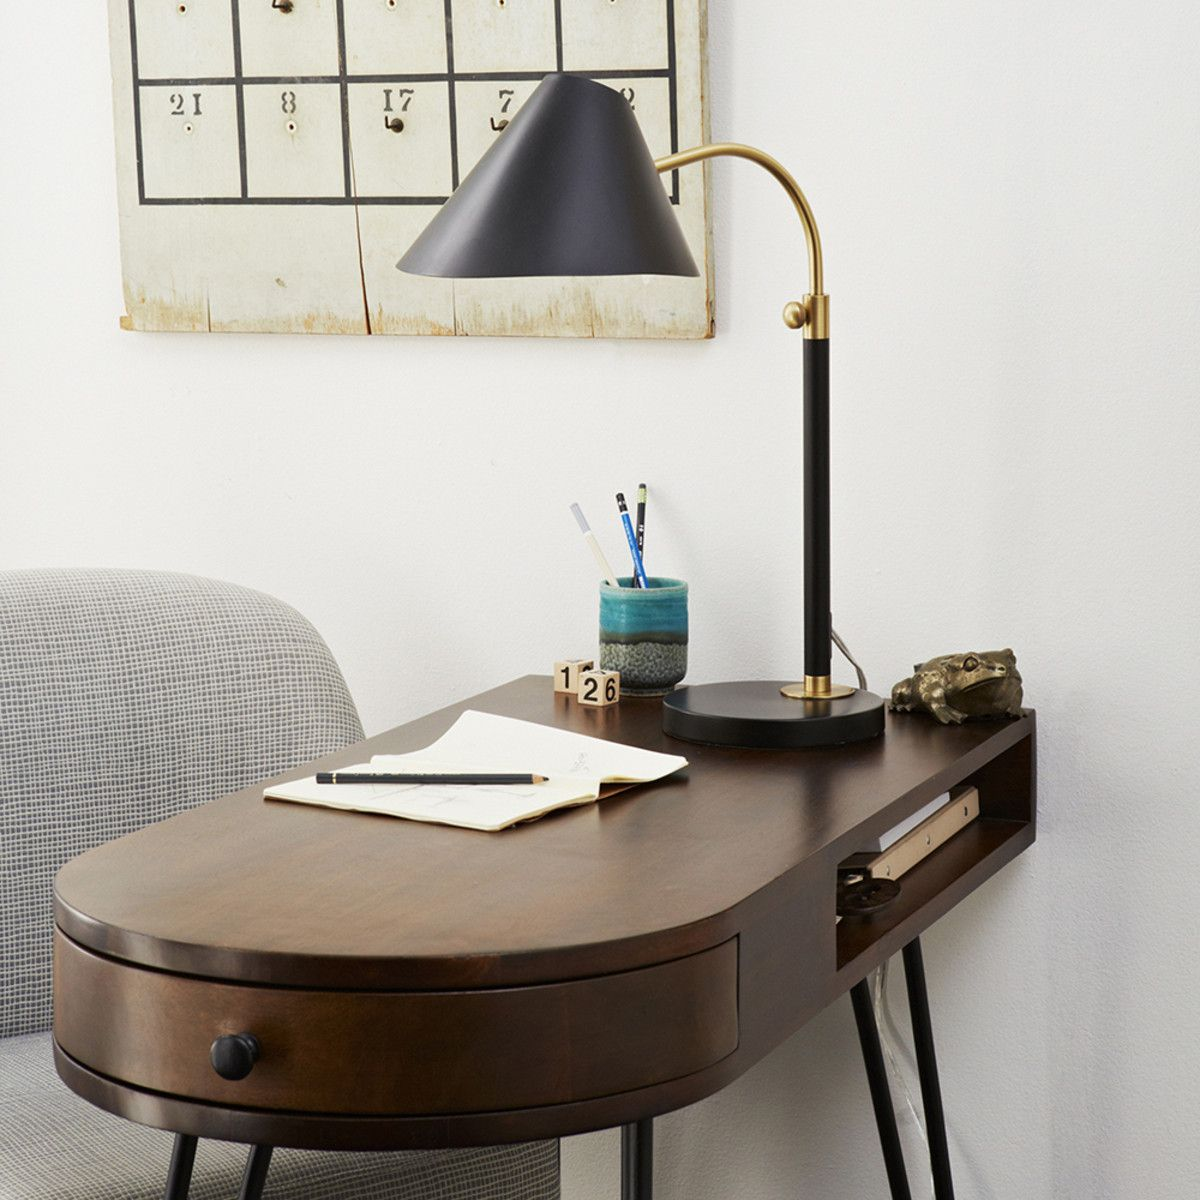 MidCentury Task Table Lamp Black West Elm / also as